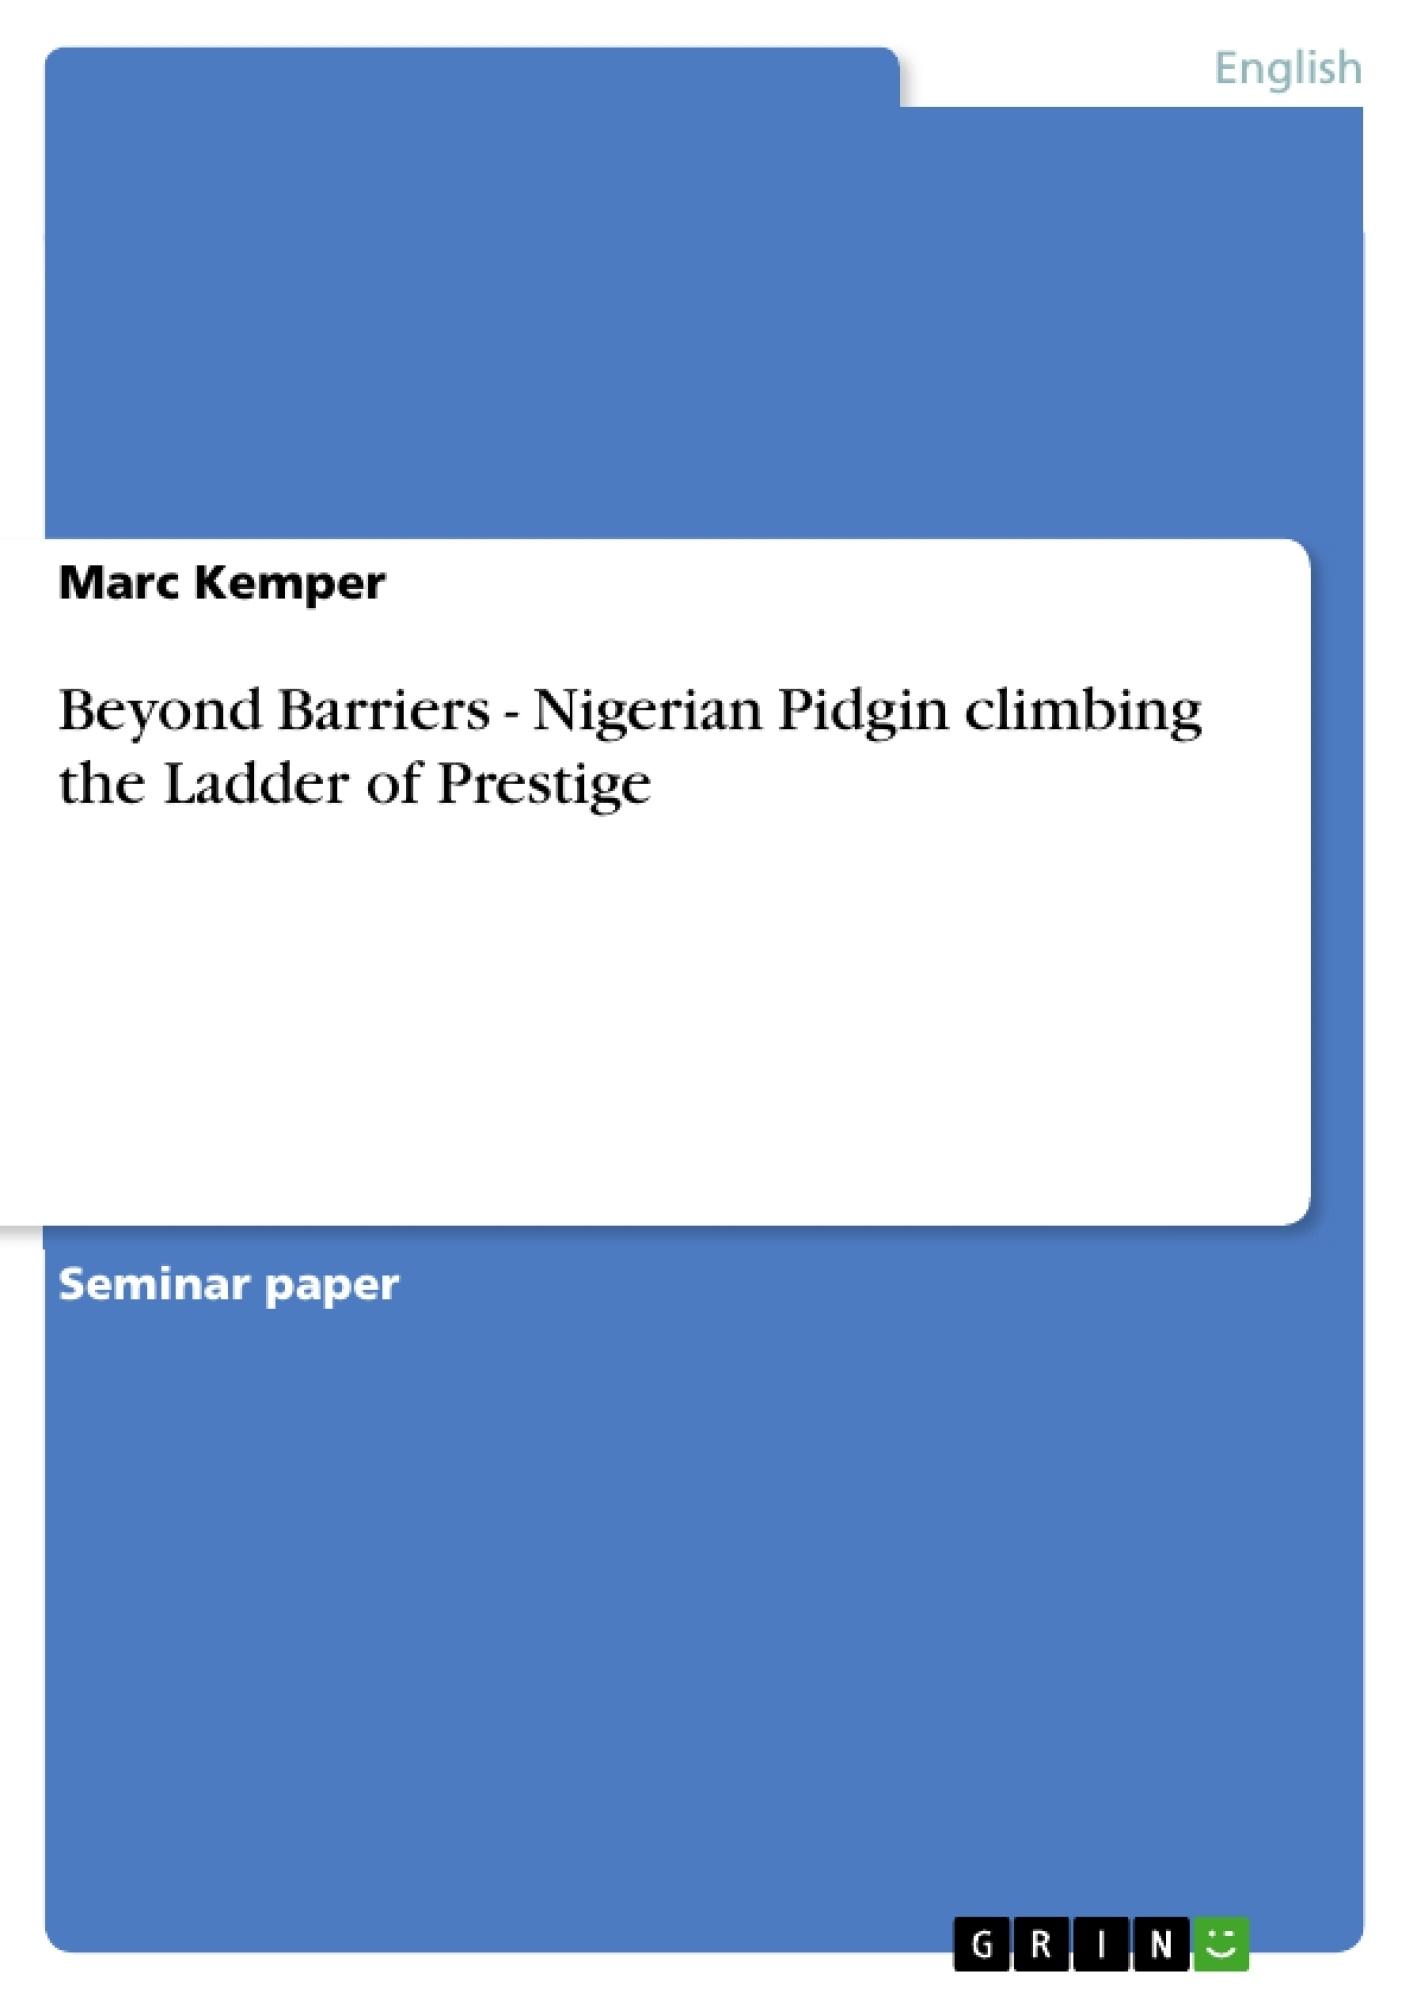 Title: Beyond Barriers - Nigerian Pidgin climbing the Ladder of Prestige